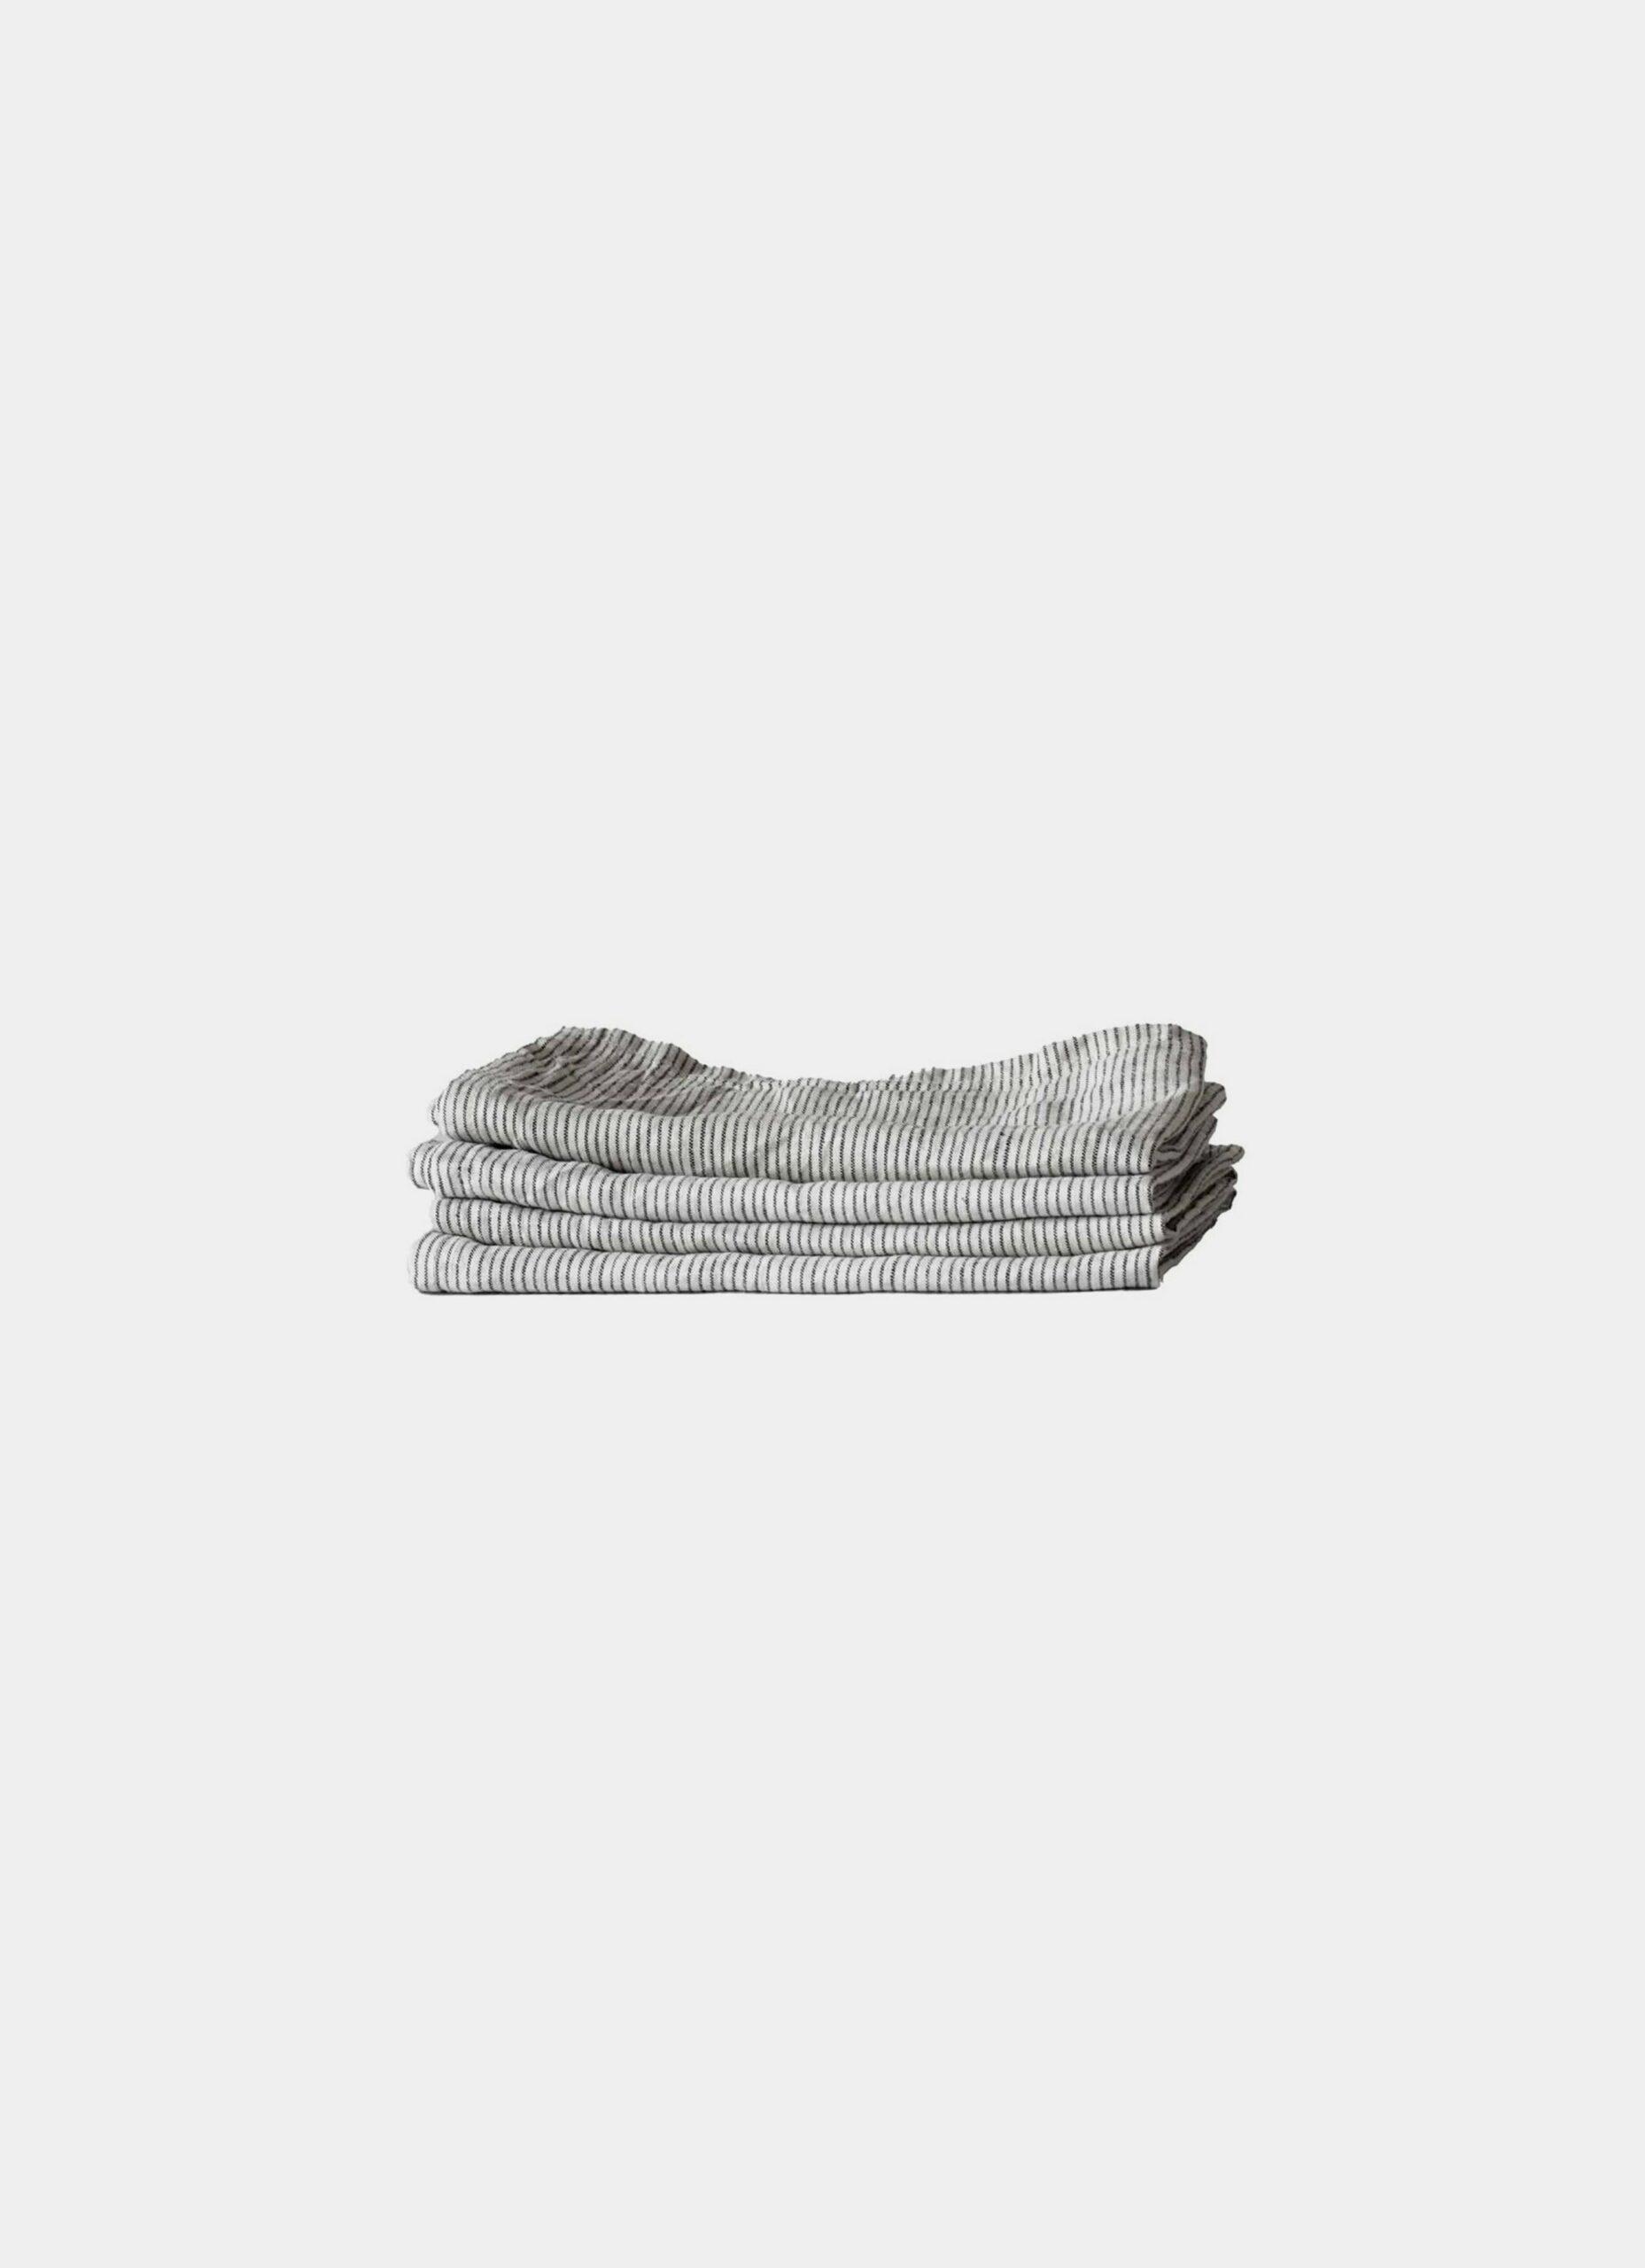 Tell Me More - Linen Napkin - Pinstripe